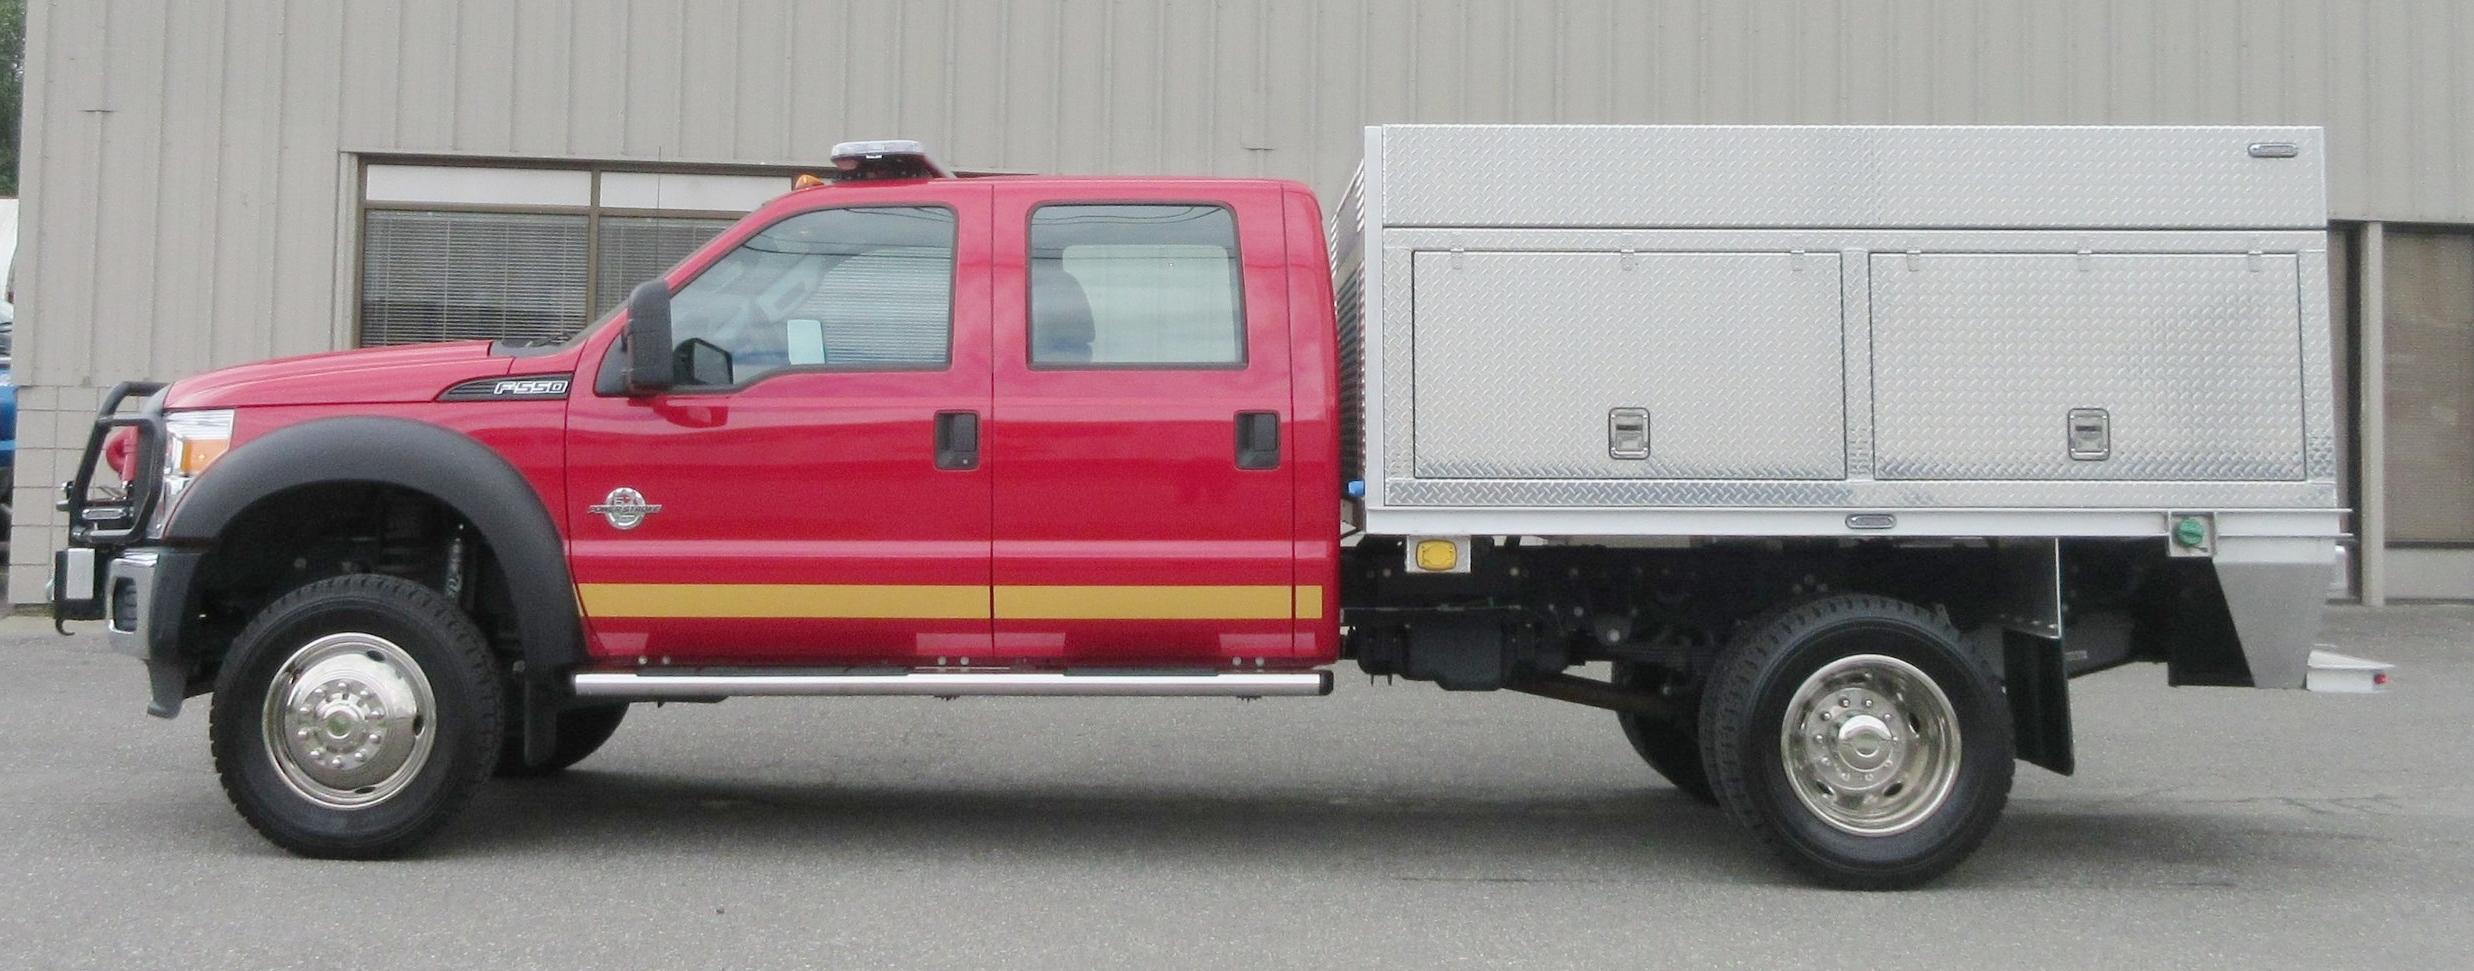 Stock Truck